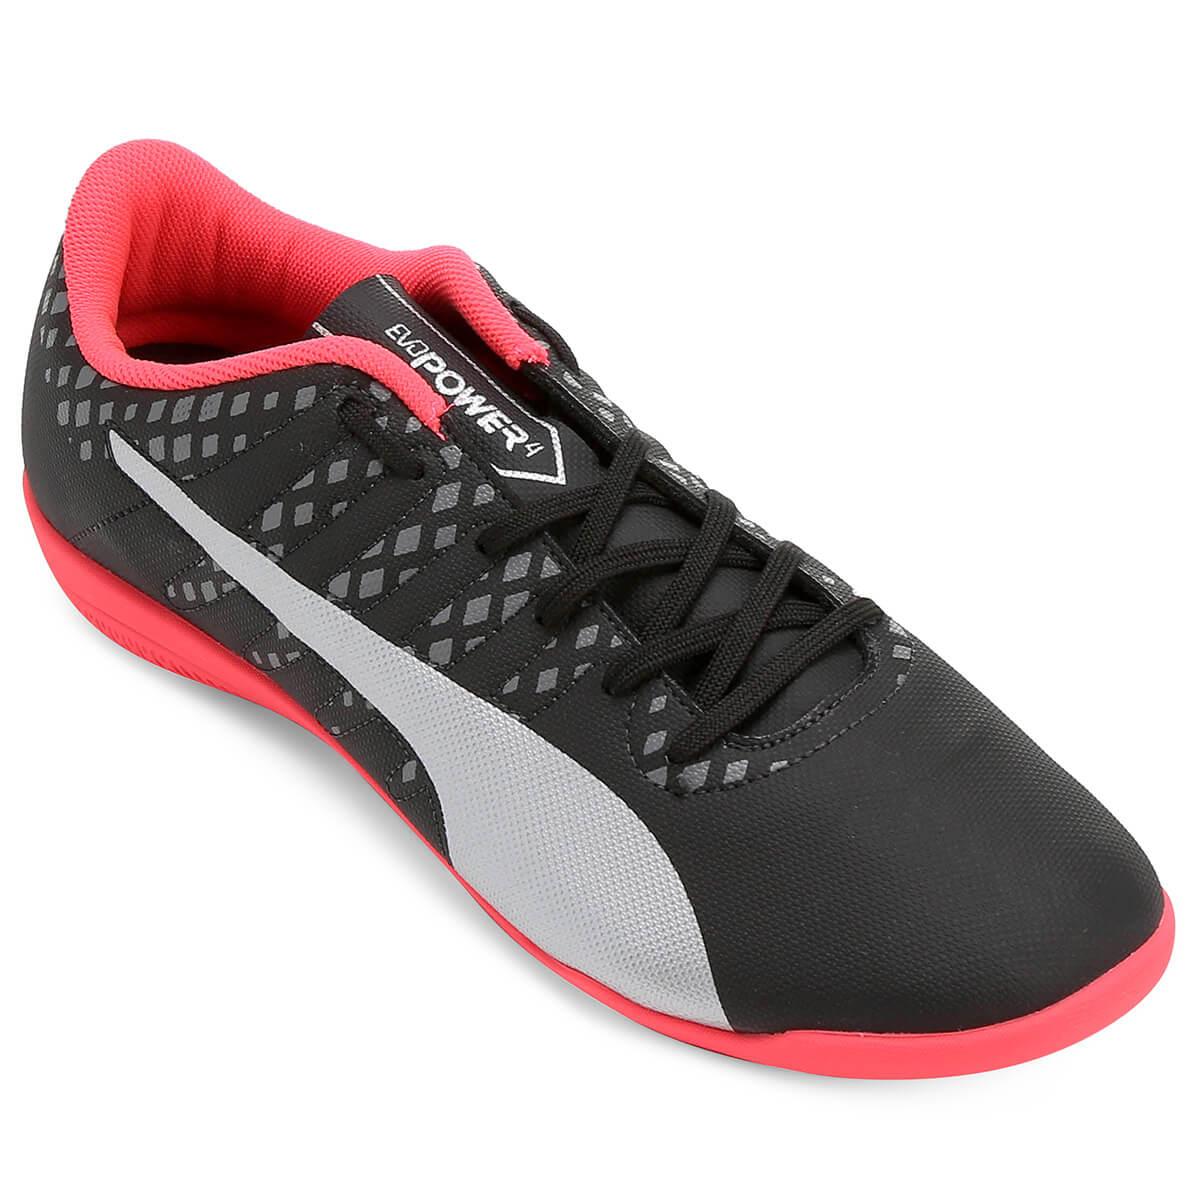 4fcc3c75b4488 Chuteira Puma Evopower Vigor 4 Futsal